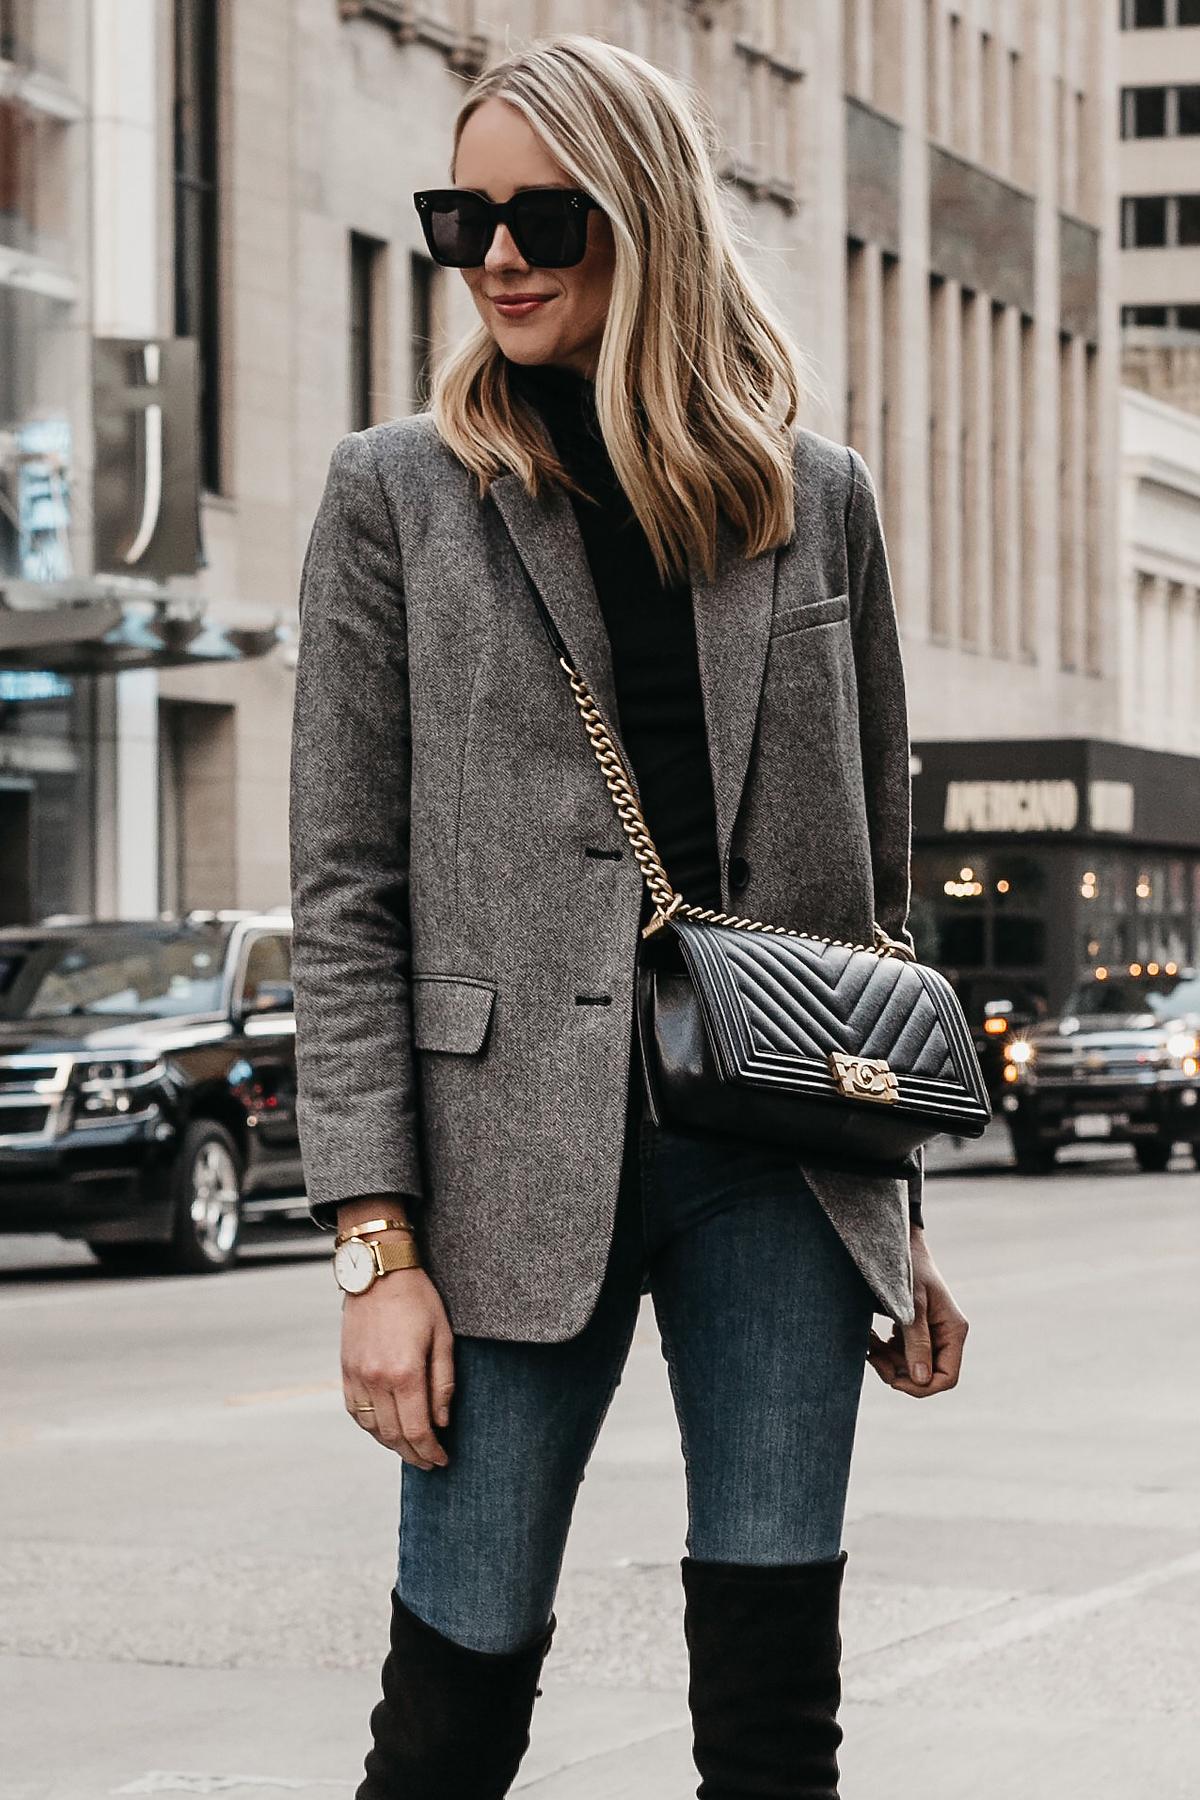 Blonde Woman Wearing Everlane Oversized Grey Blazer Chanel Black Boy Bag Denim Jeans Fashion Jackson Dallas Blogger Fashion Blogger Street Style